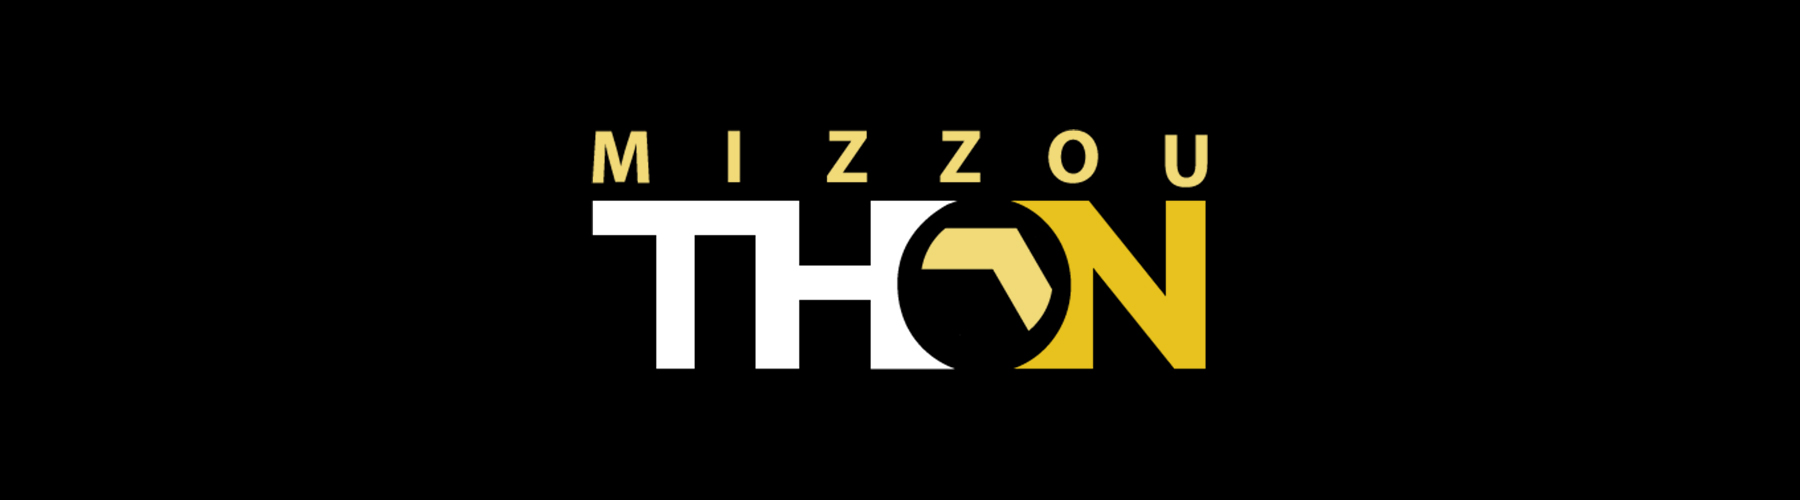 website_mizzouthon_banner.jpg